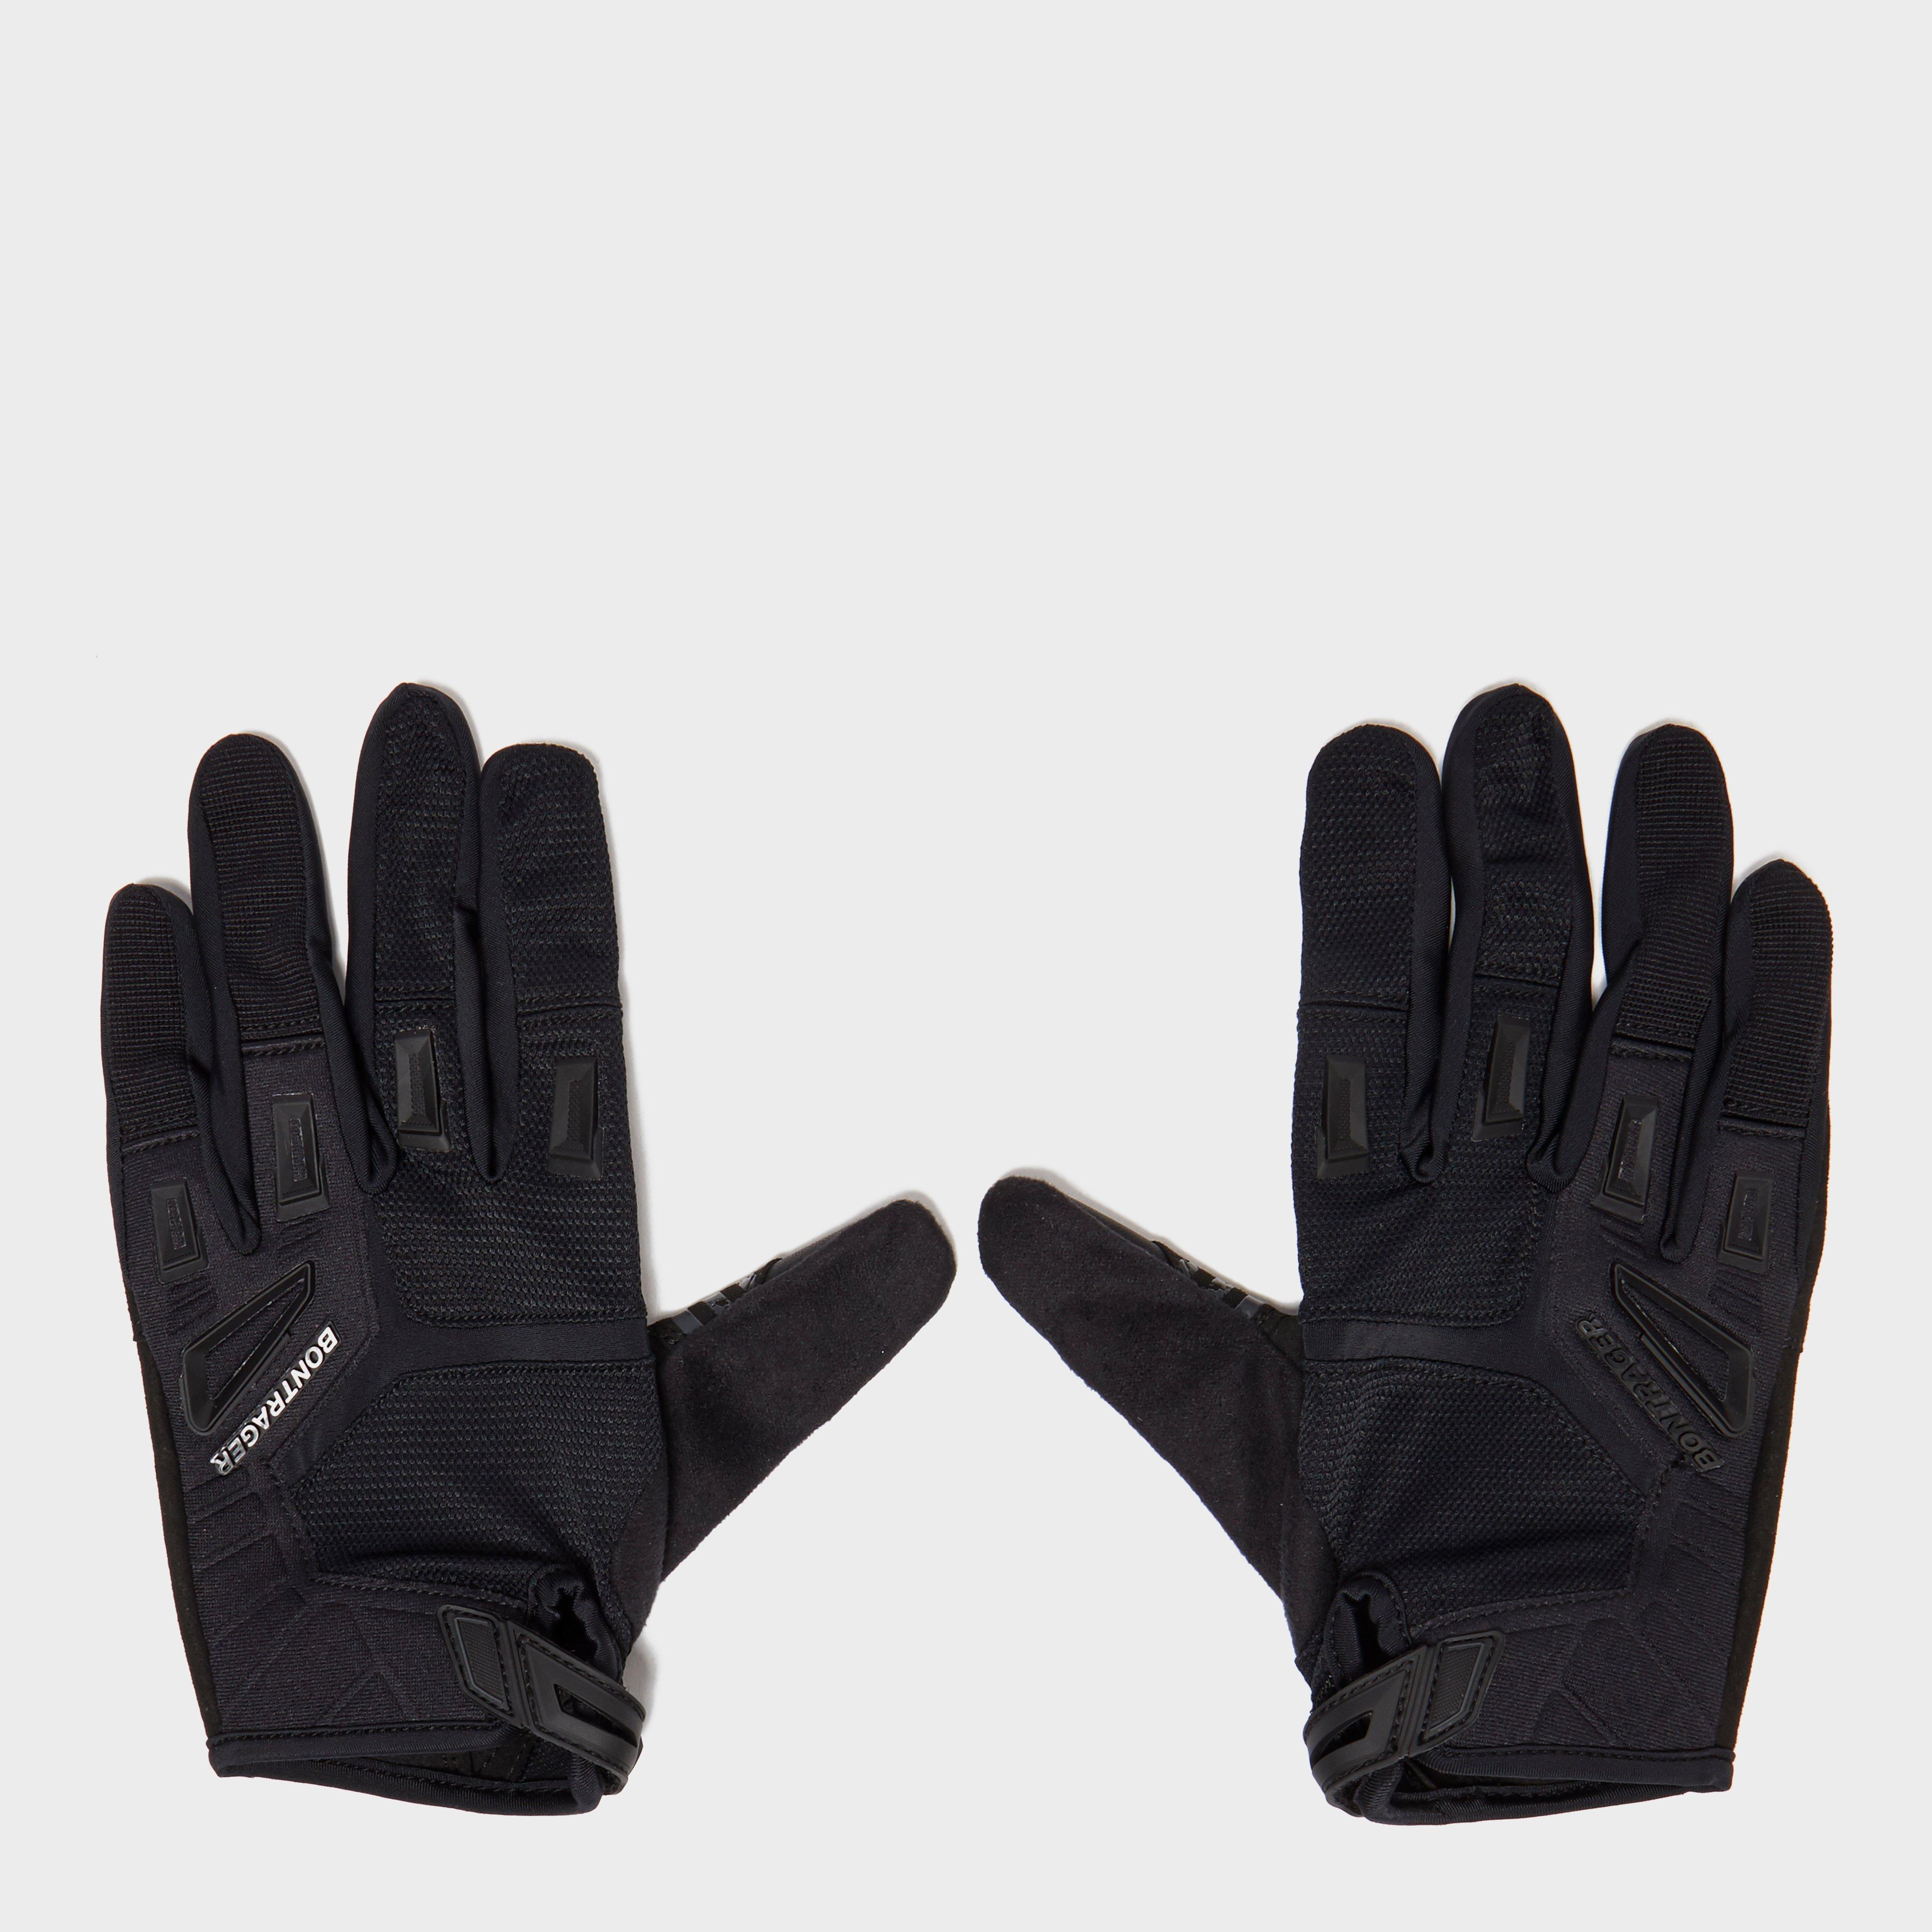 Bontrager Lithos Mountain Bike Gloves, Black